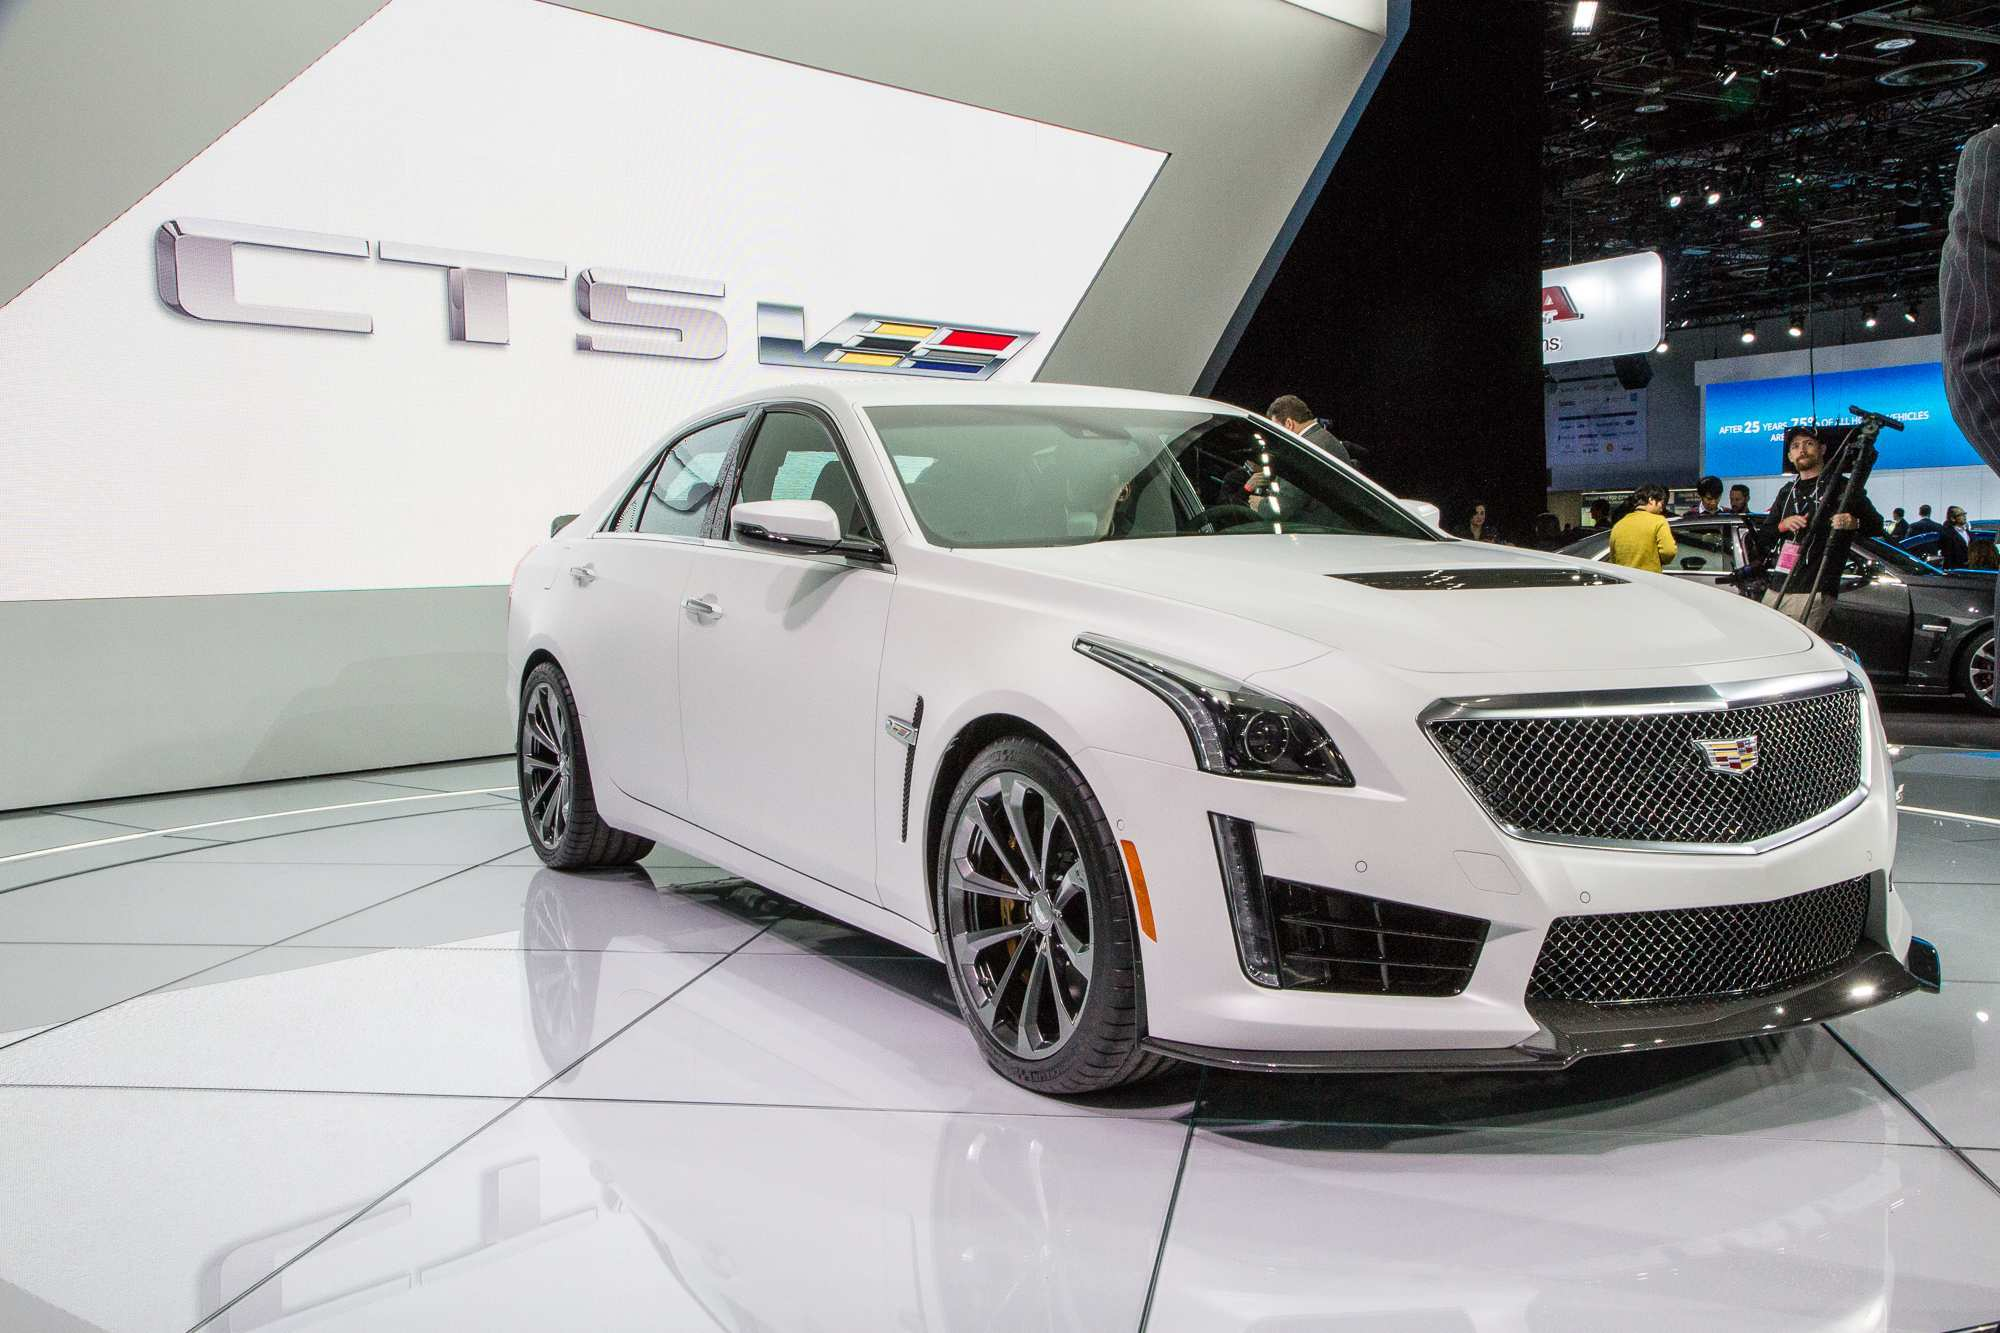 99 Concept of 2020 Cadillac Ats Pricing for 2020 Cadillac Ats